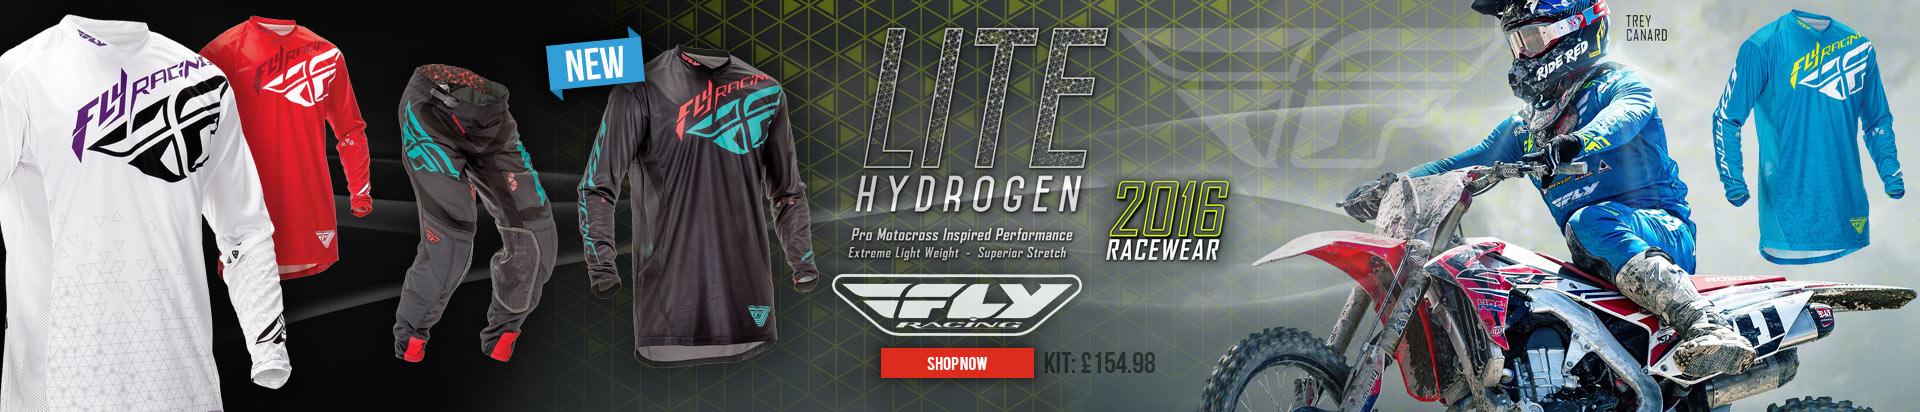 Fly Hydrogen Kit